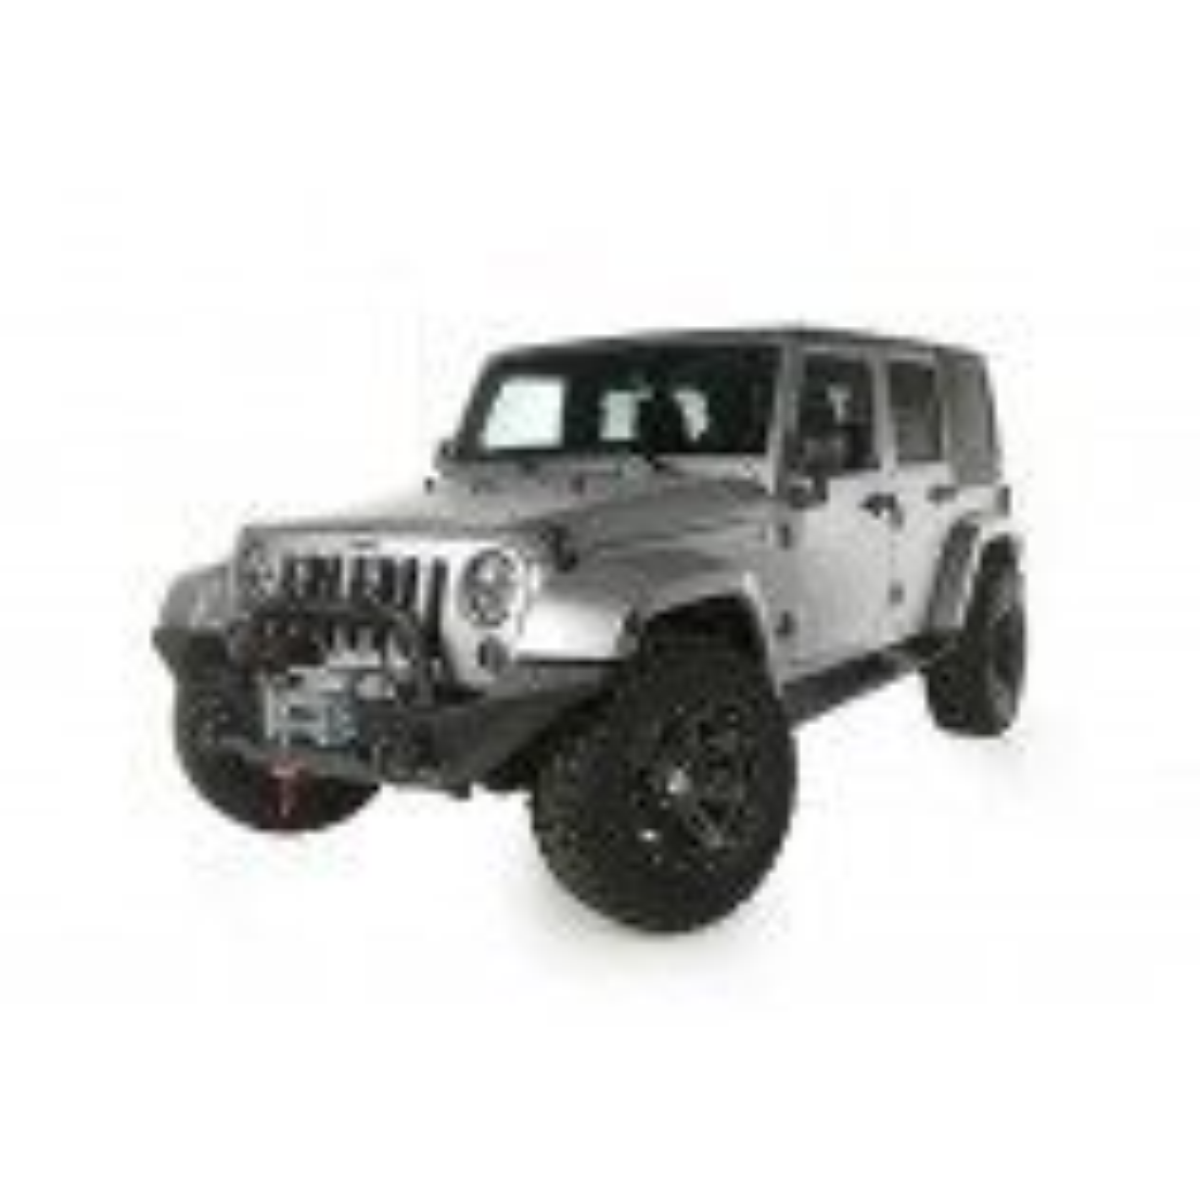 Granite Package, 07-12 Jeep Wrangler